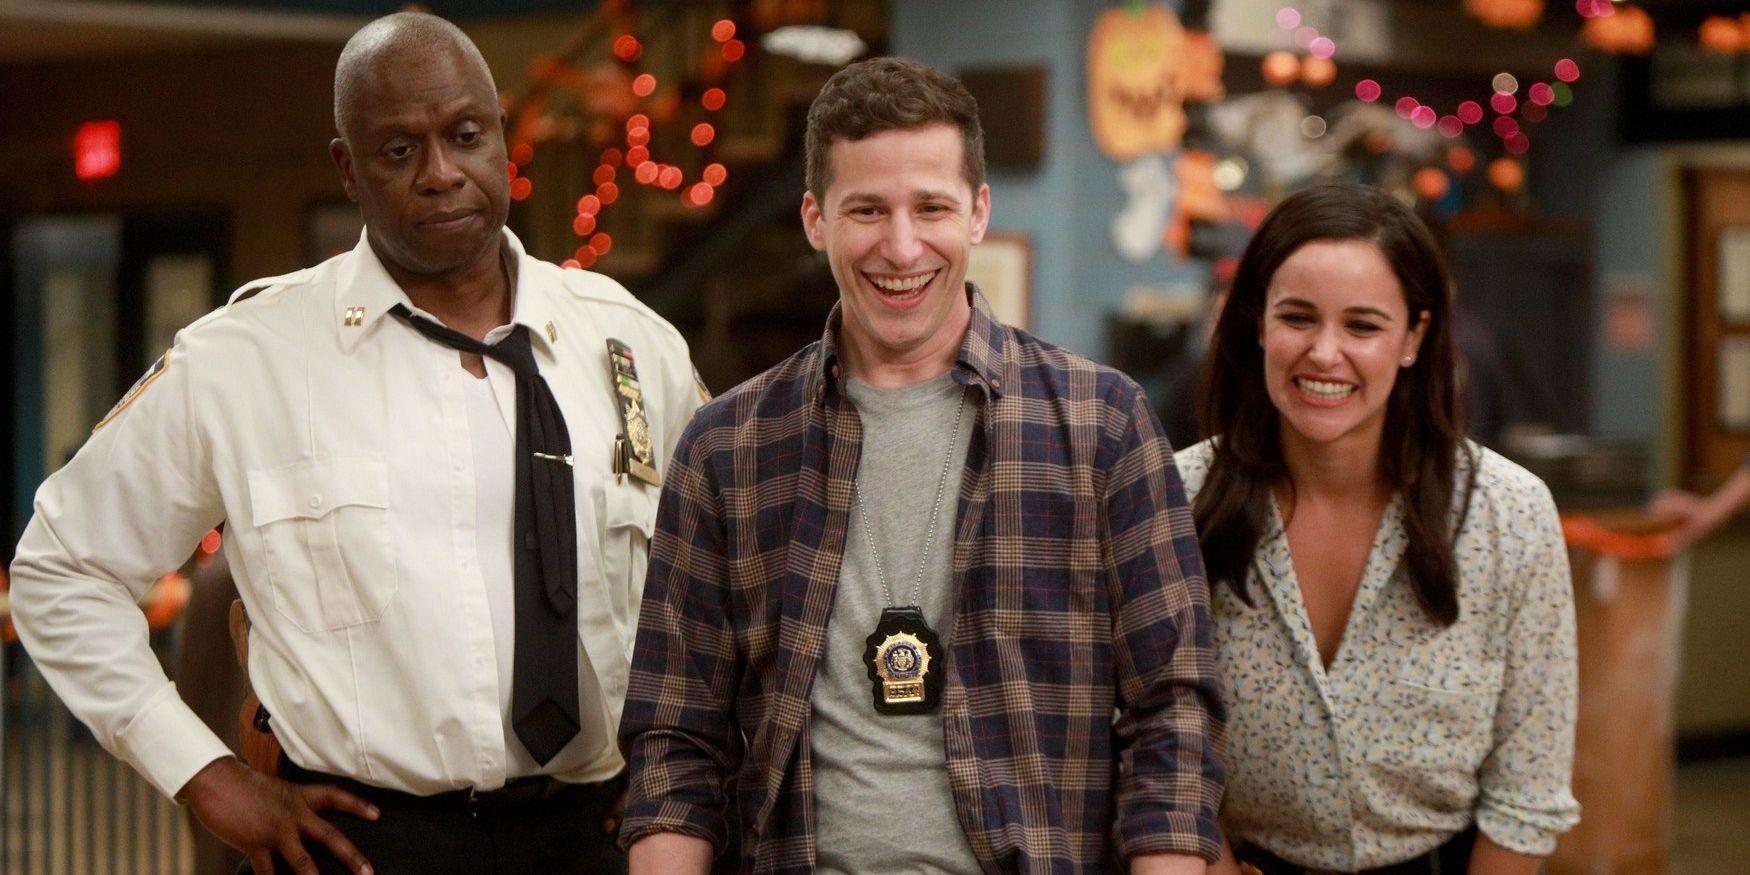 Brooklyn Nine-Nine stars Melissa Fumero and Andre Braugher